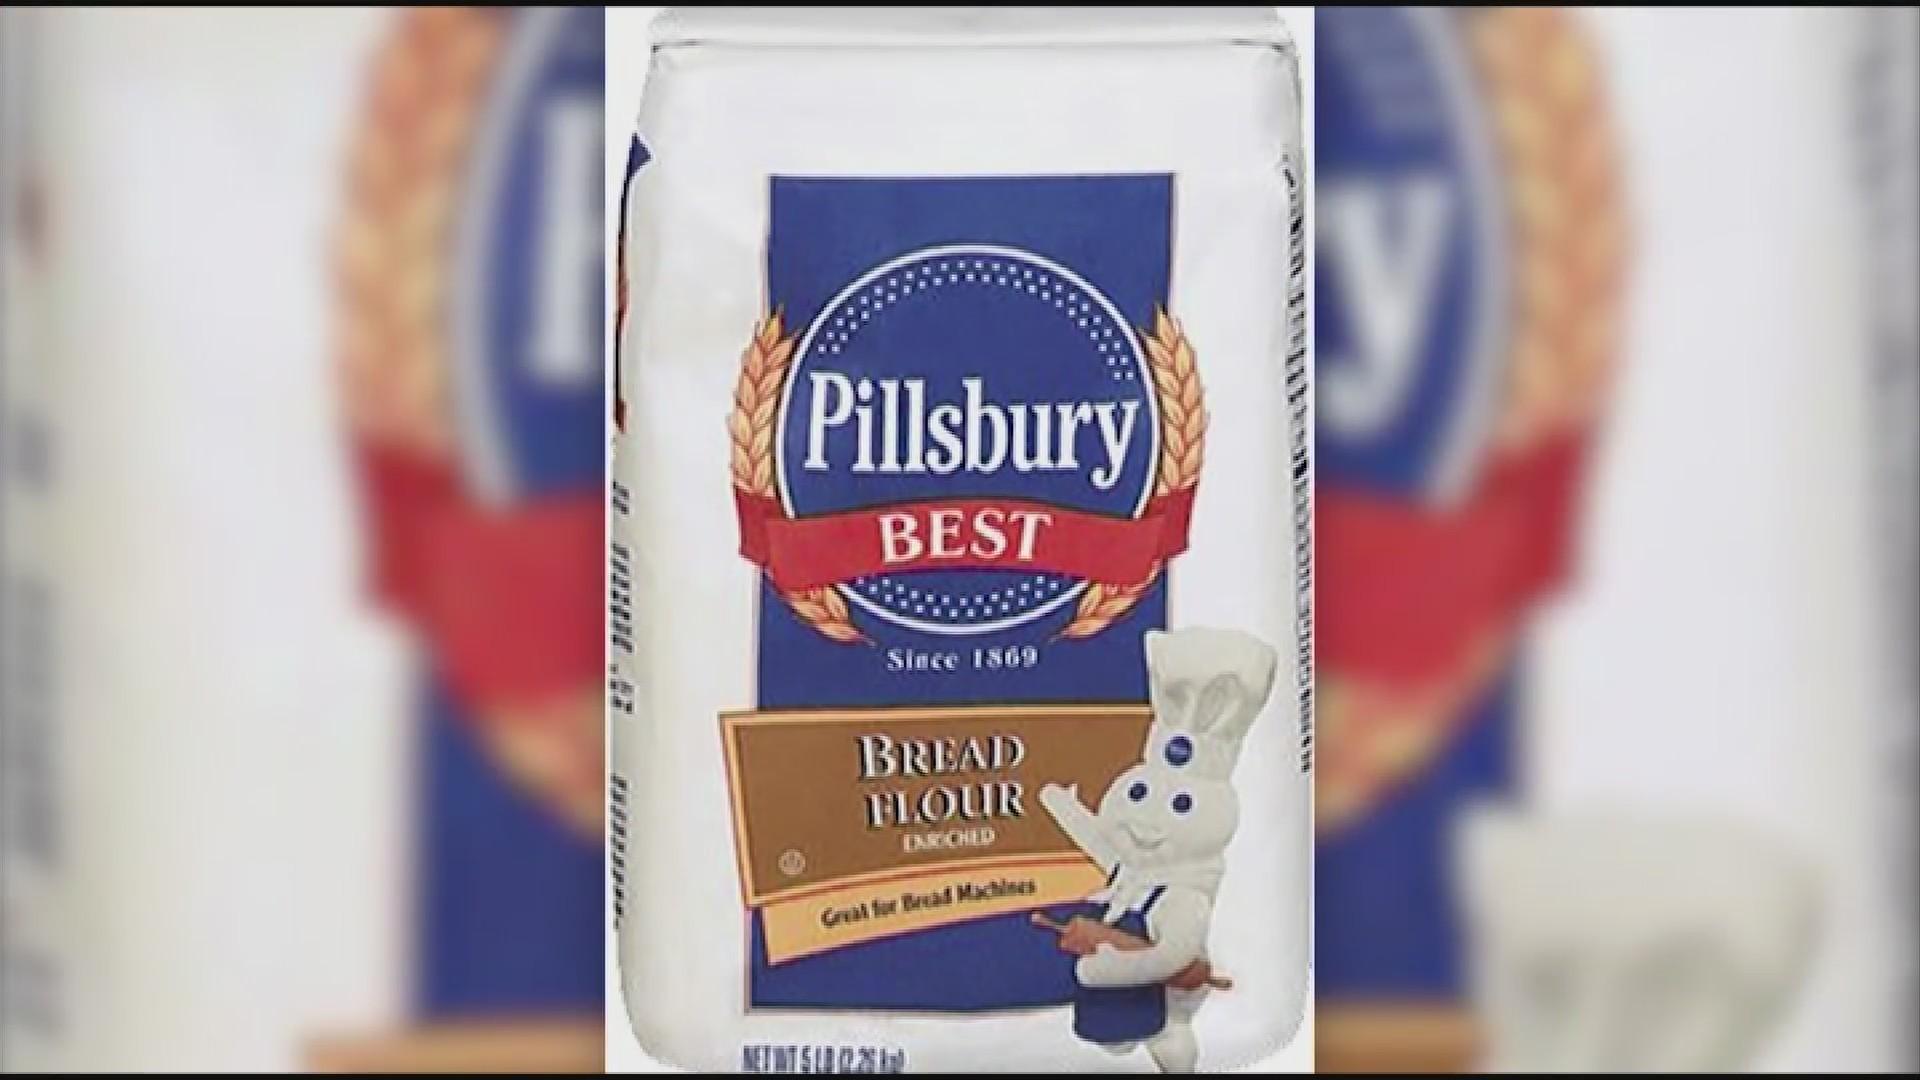 Pillsbury flour recalled due to E. coli concerns